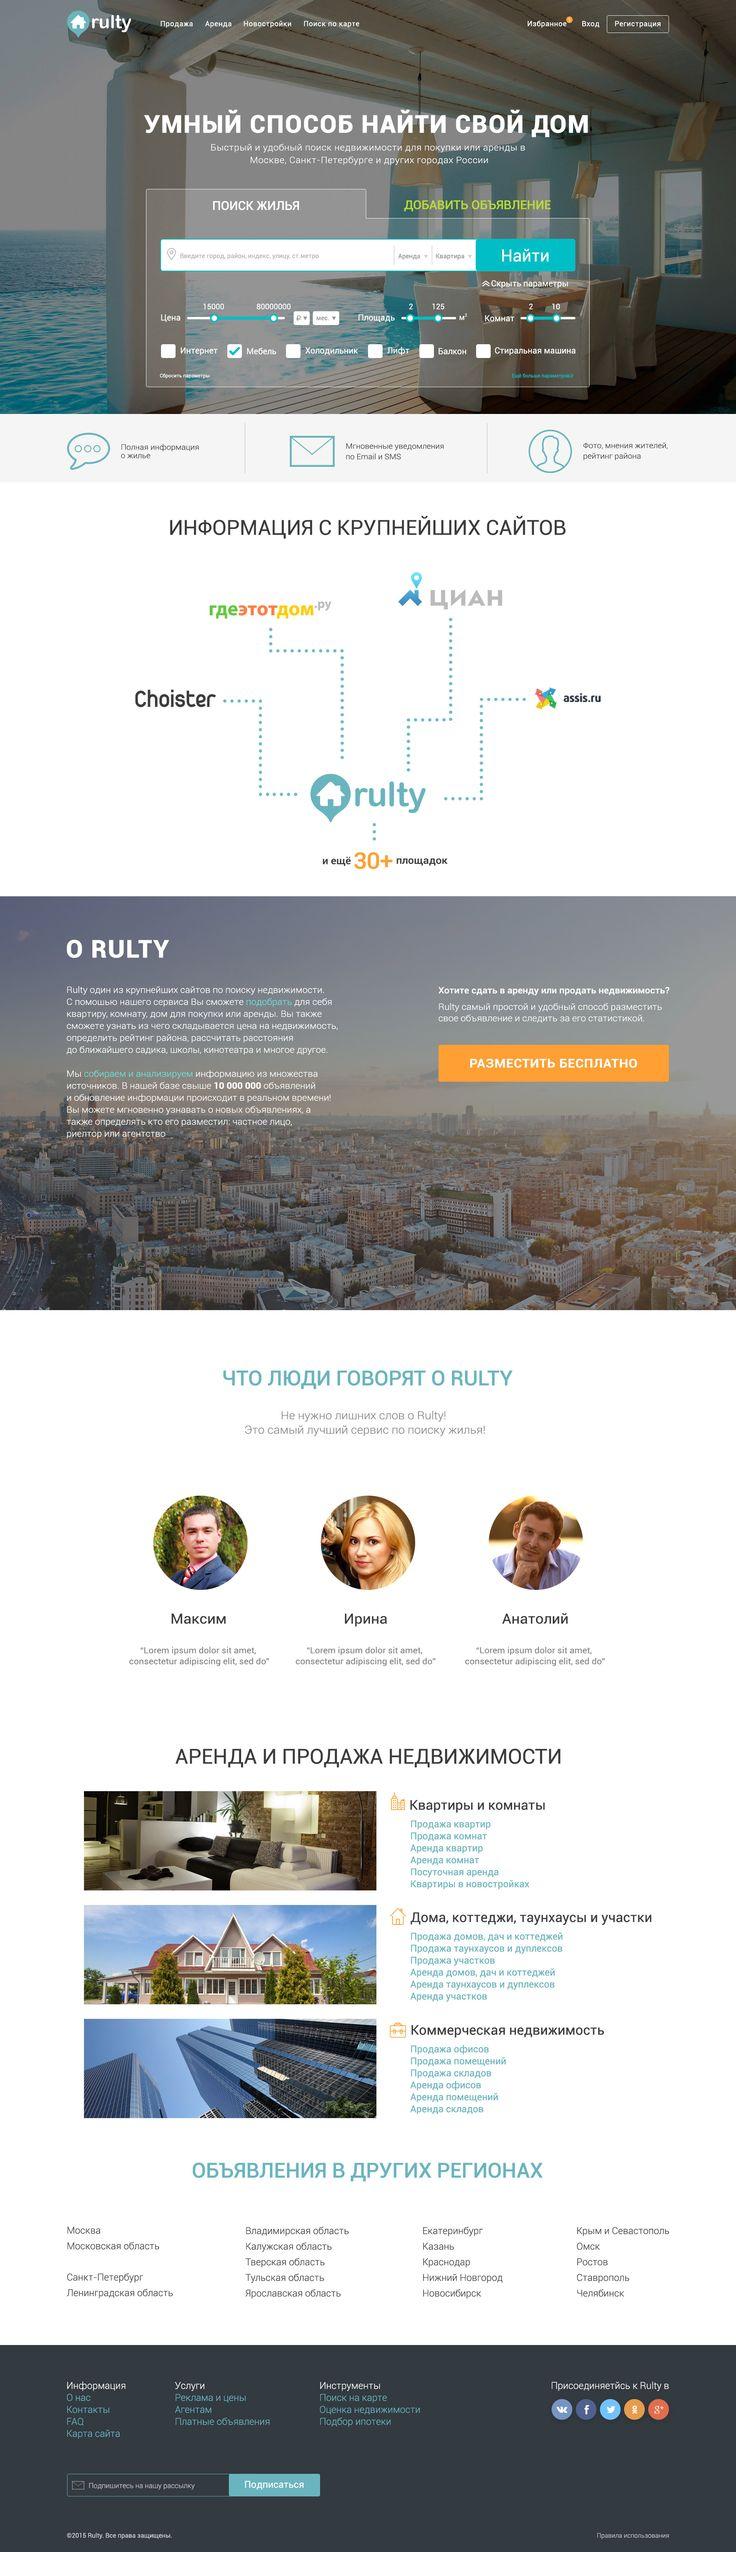 Homepage Rulty (Final version) - artzoomi.com